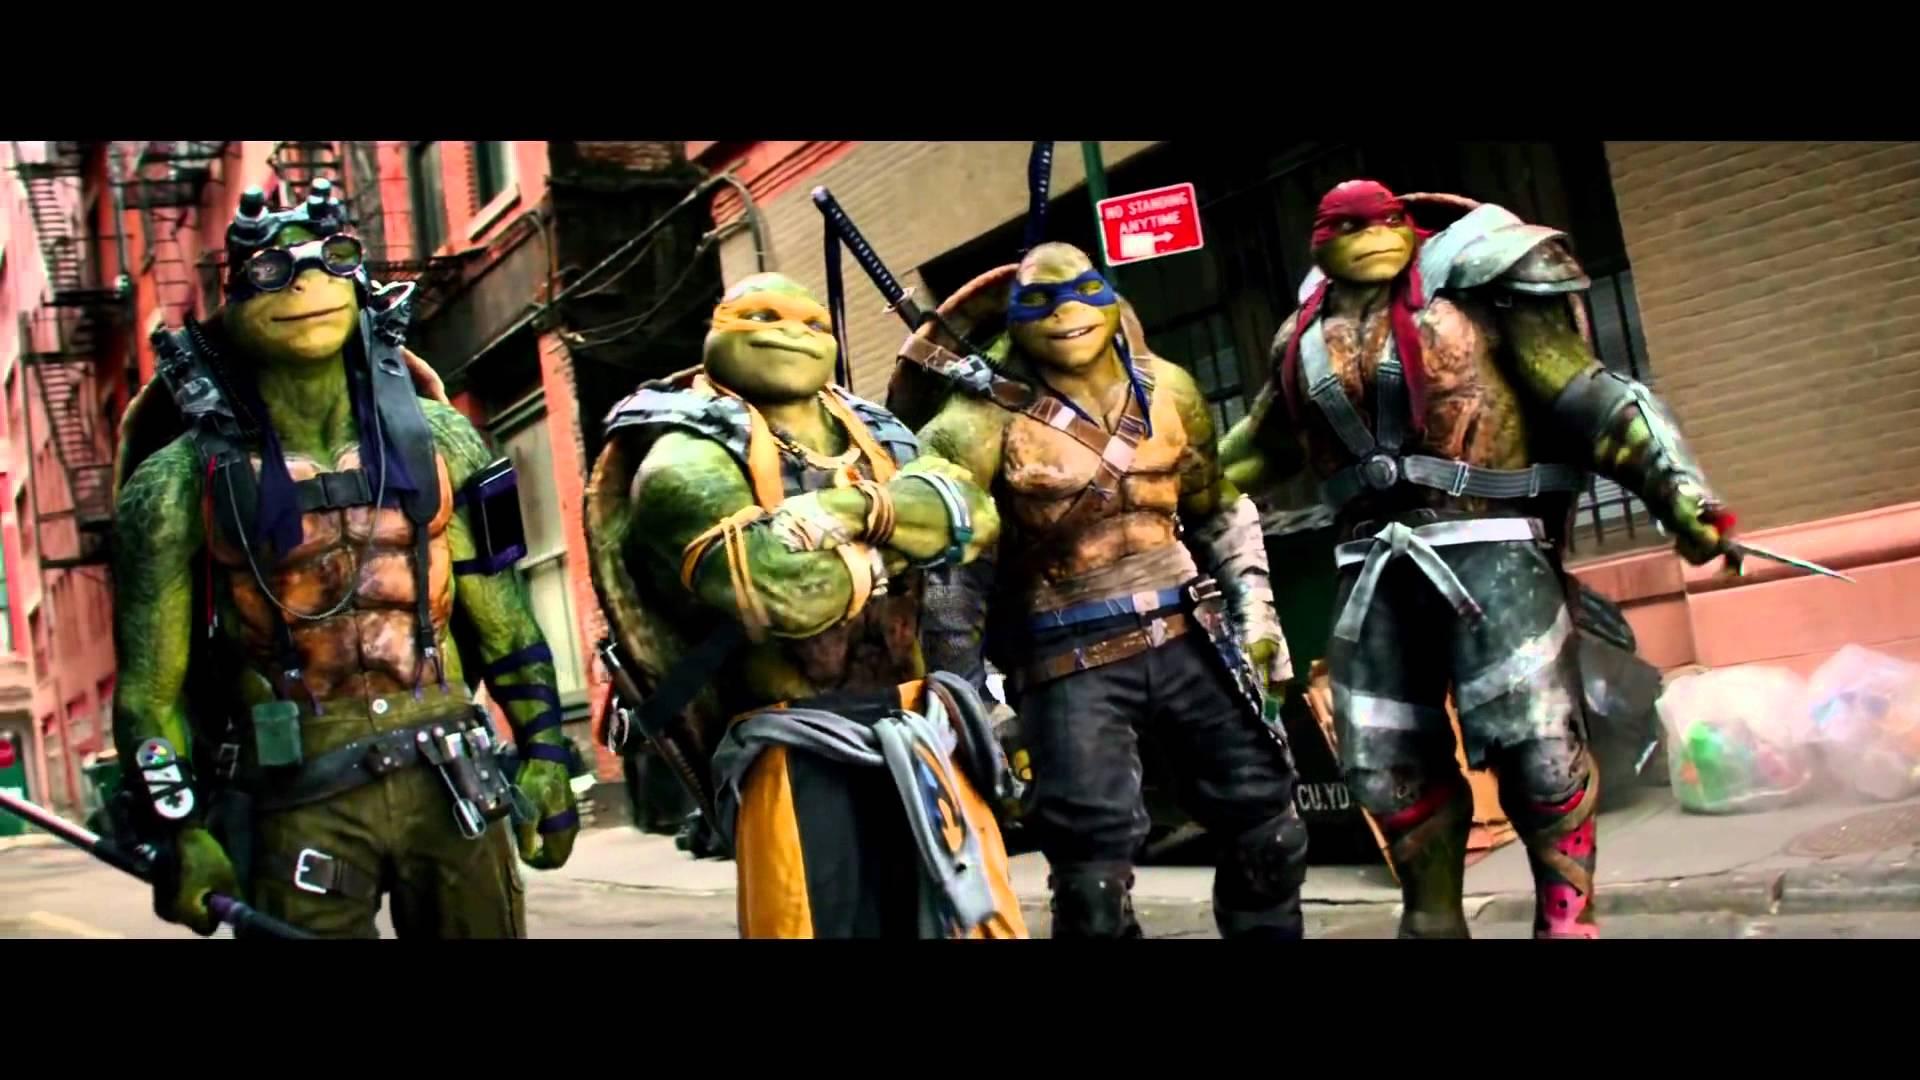 Teenage Mutant Ninja Turtles 2016 Wallpapers Wallpaper Cave